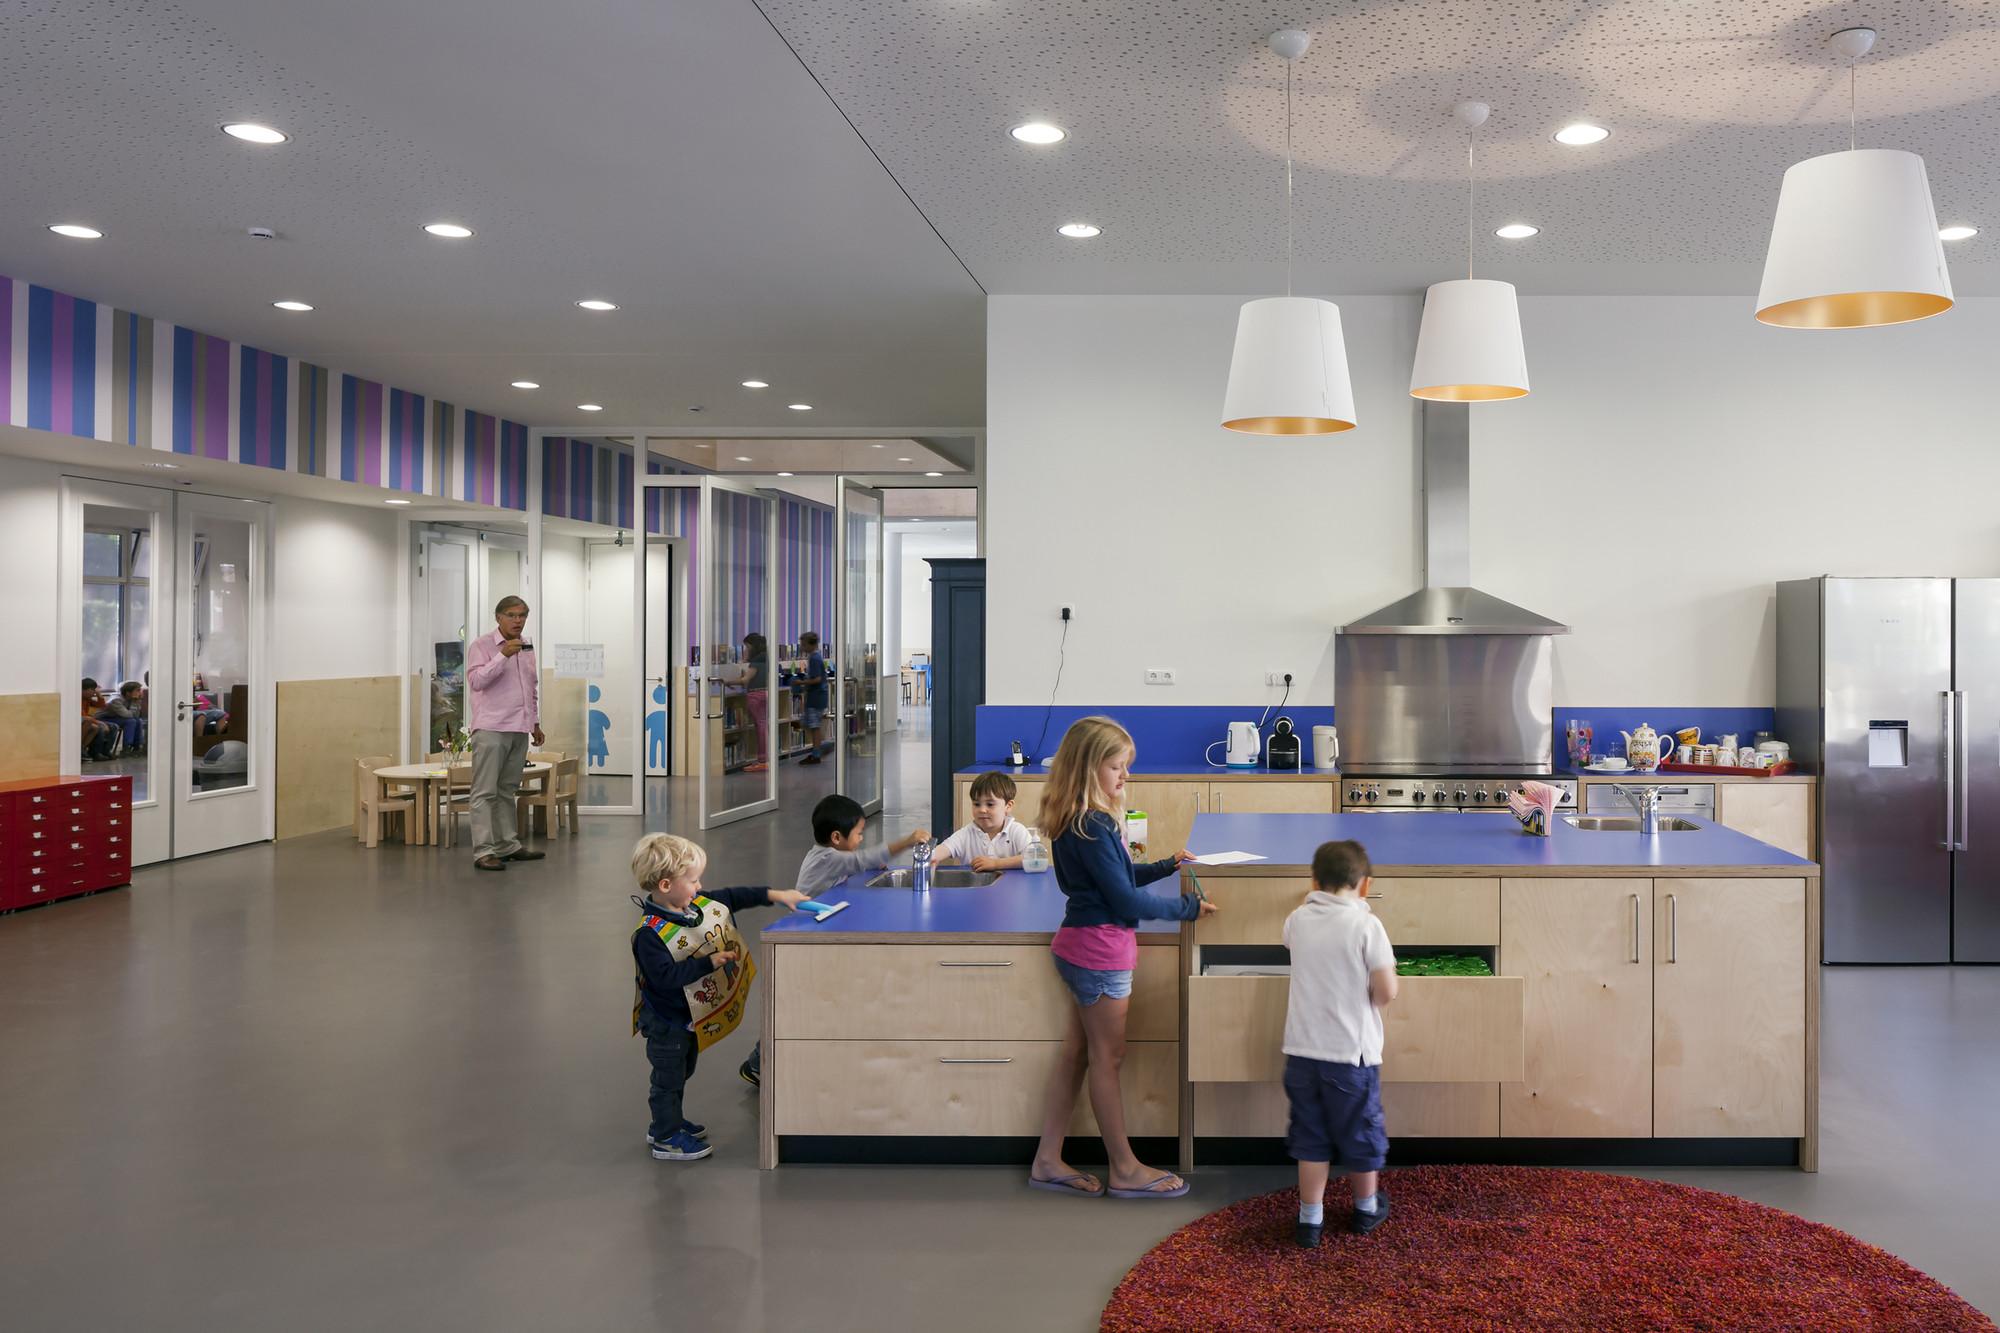 Montessori School Waalsdorp De Zwarte Hond on Design A Kitchen Floor Plan